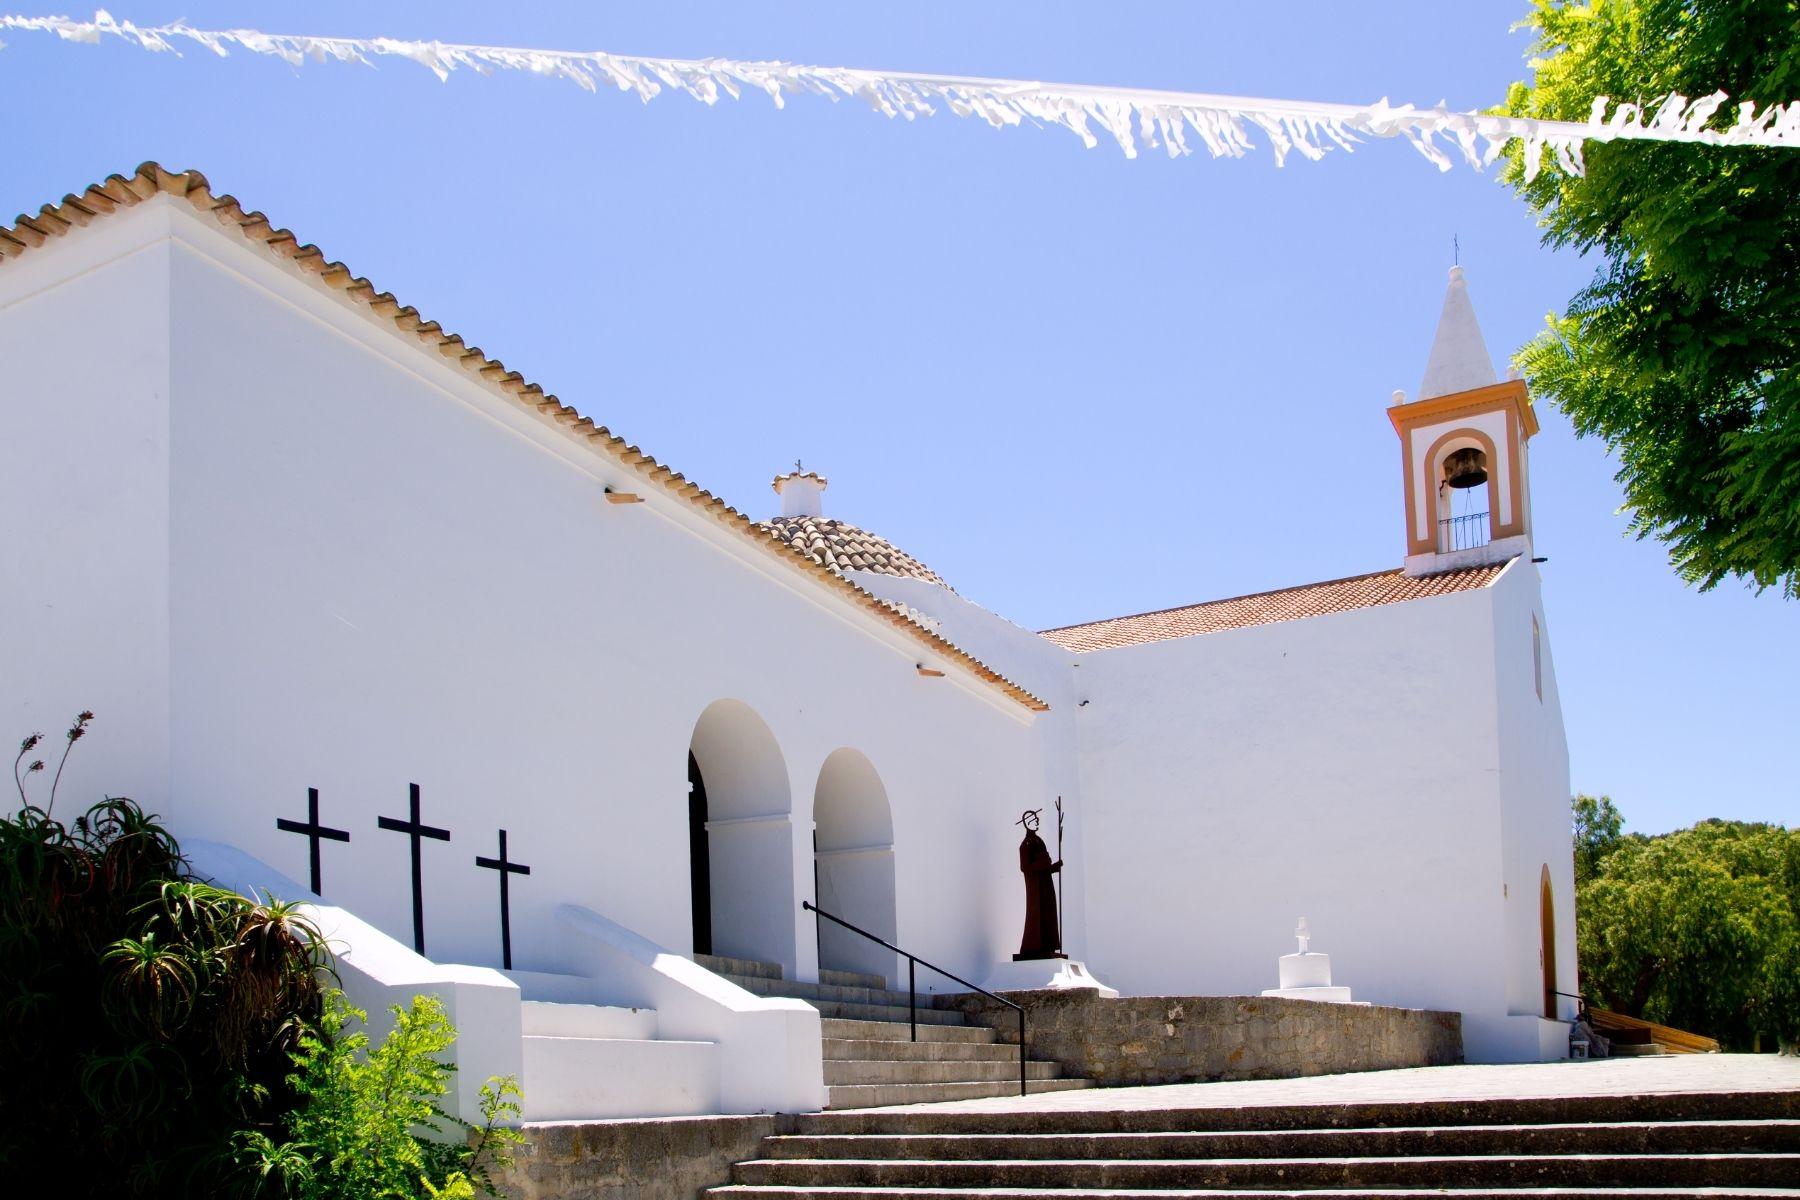 Living in Ibiza: Life in Sant Joan de Labritja (San Juan Bautista)